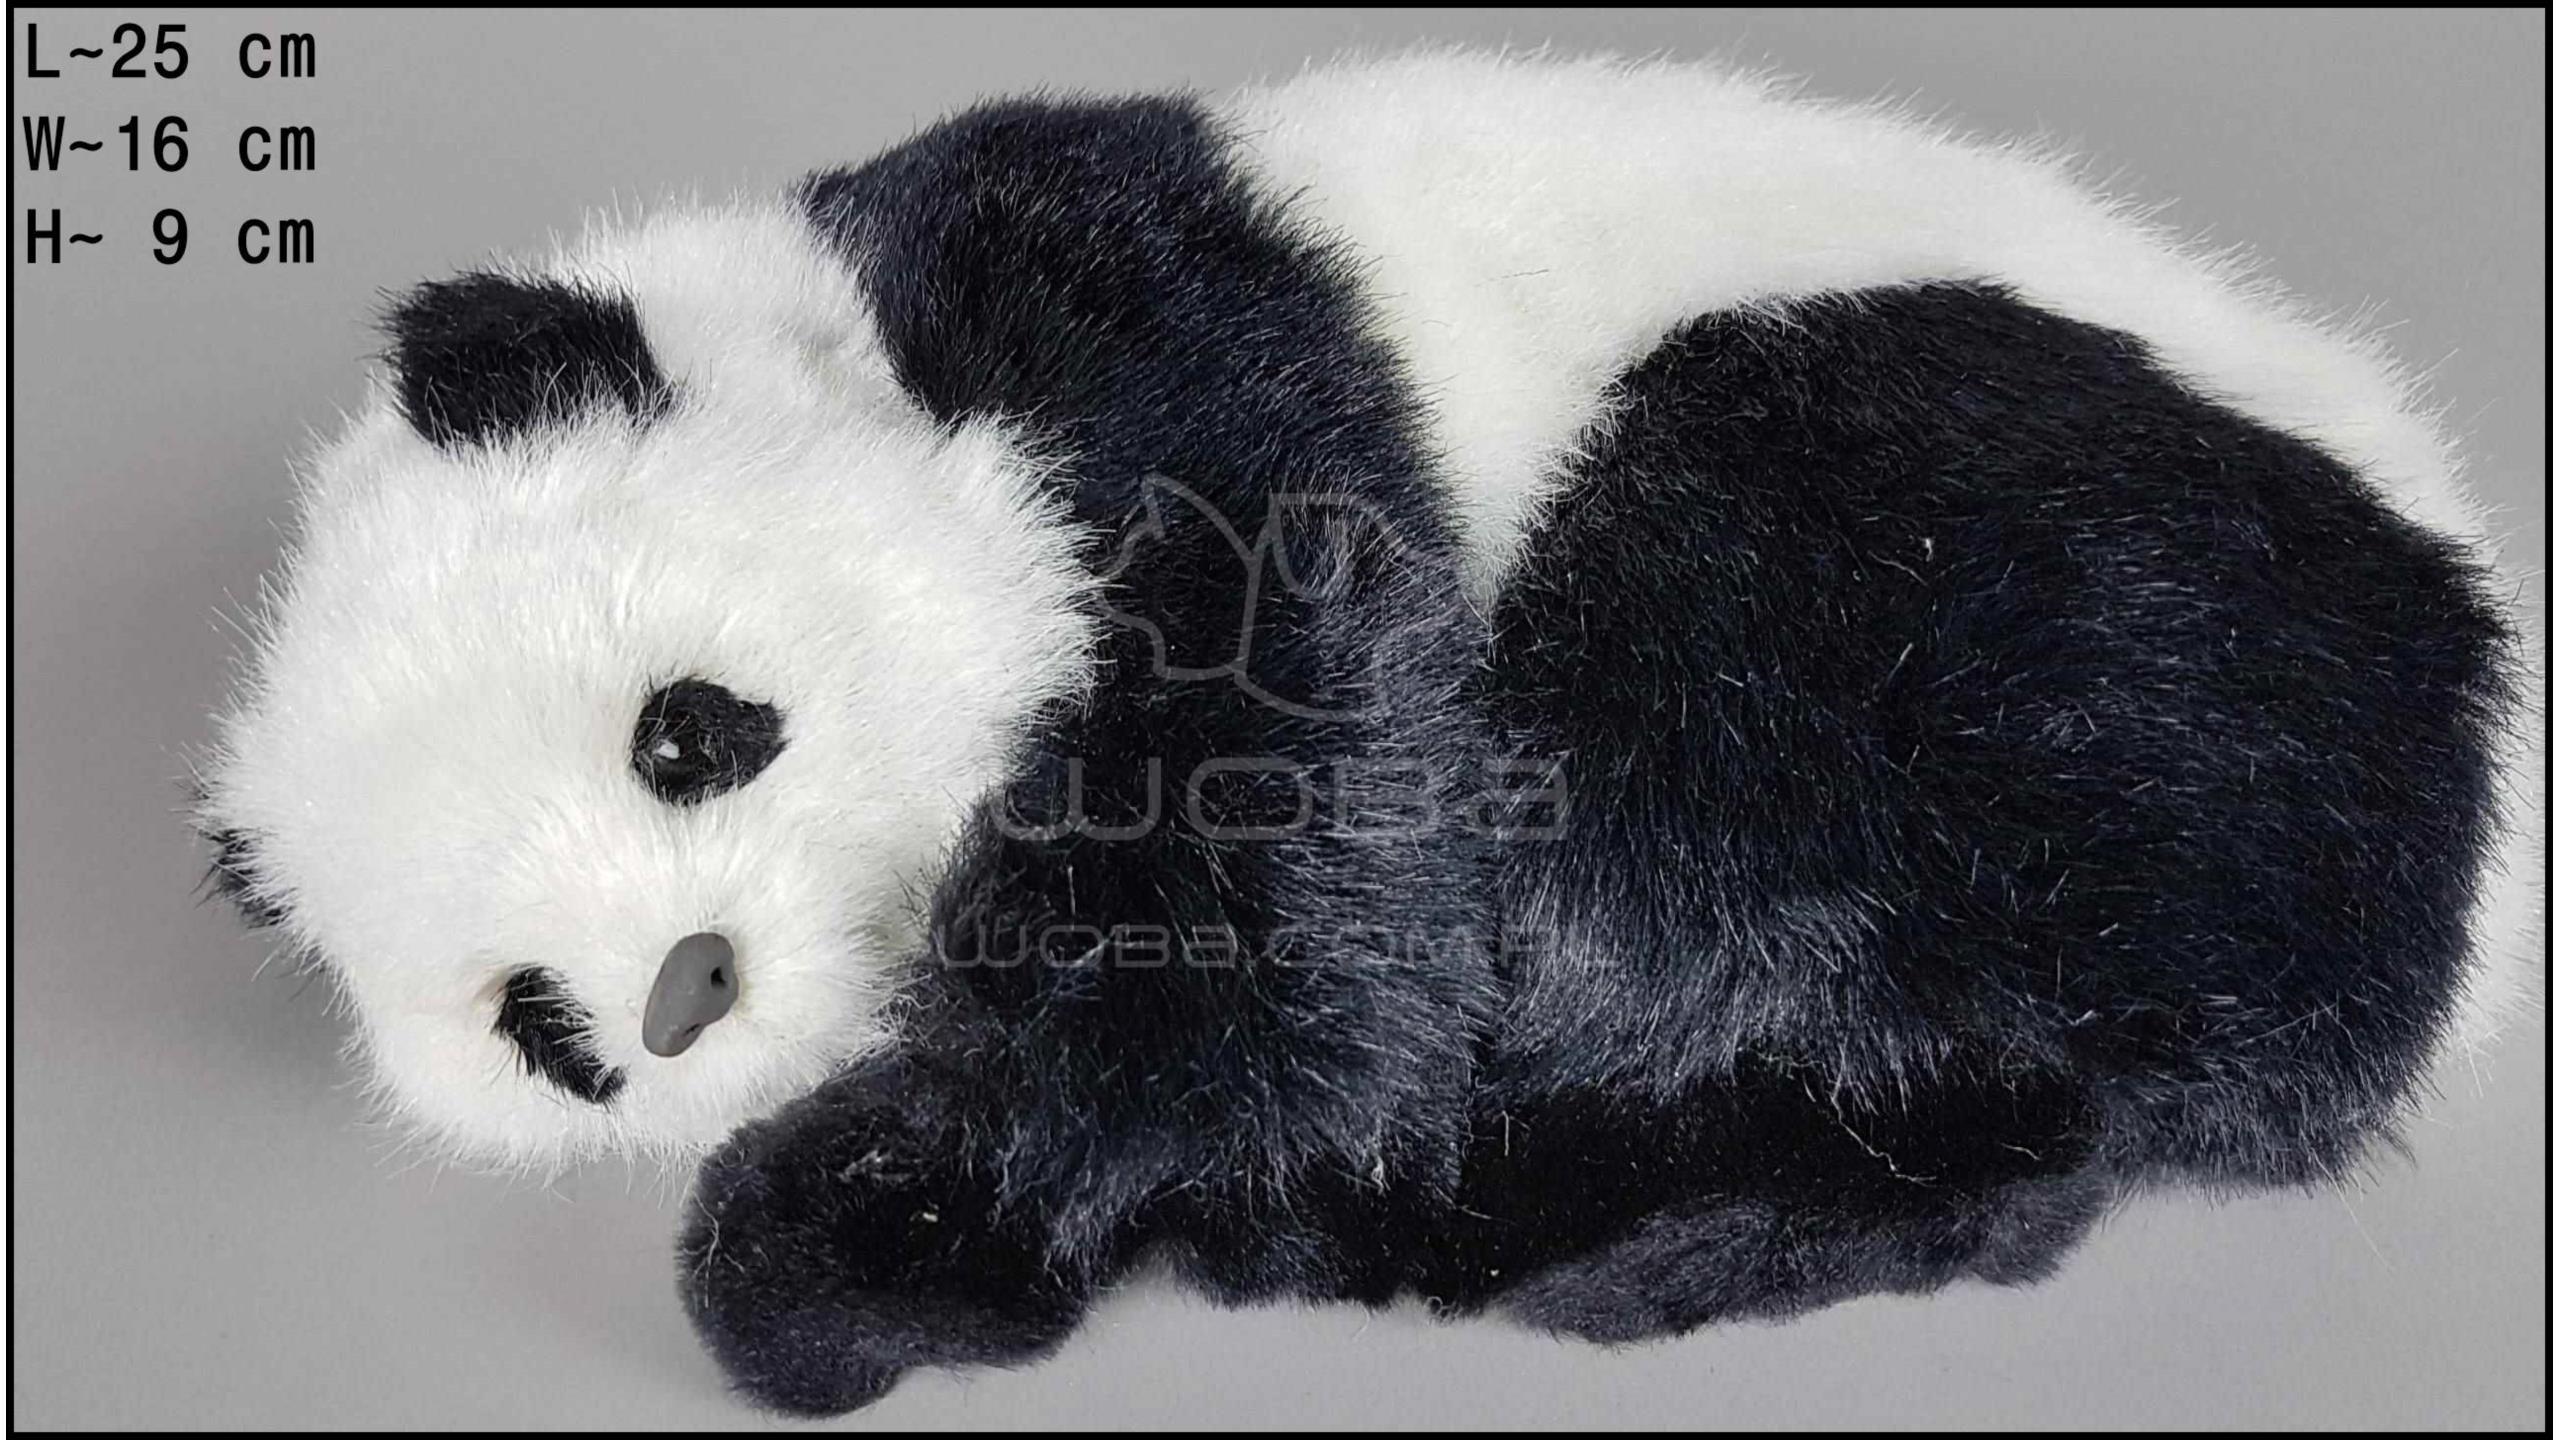 Panda Leżąca